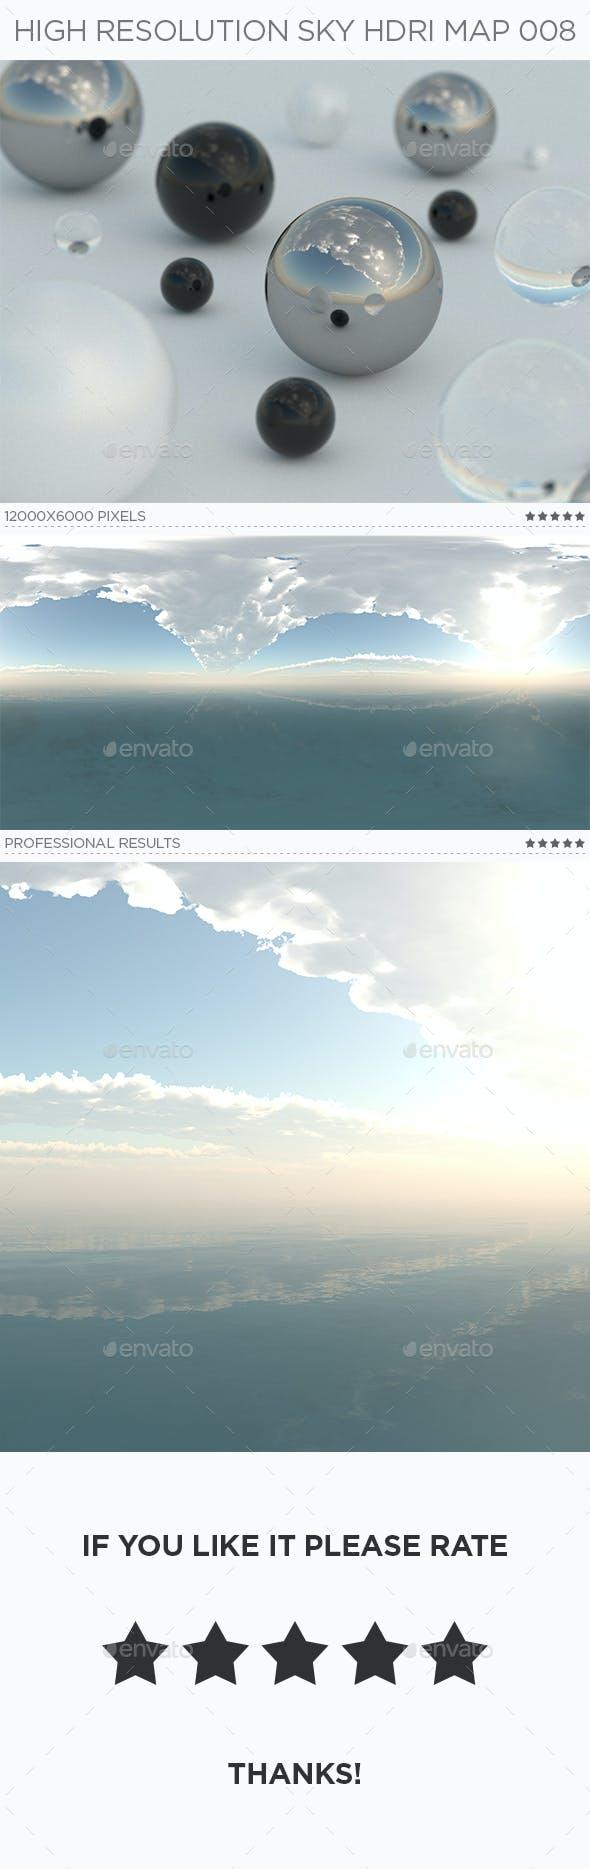 High Resolution sky HDRi Map 008 - 3DOcean Item for Sale